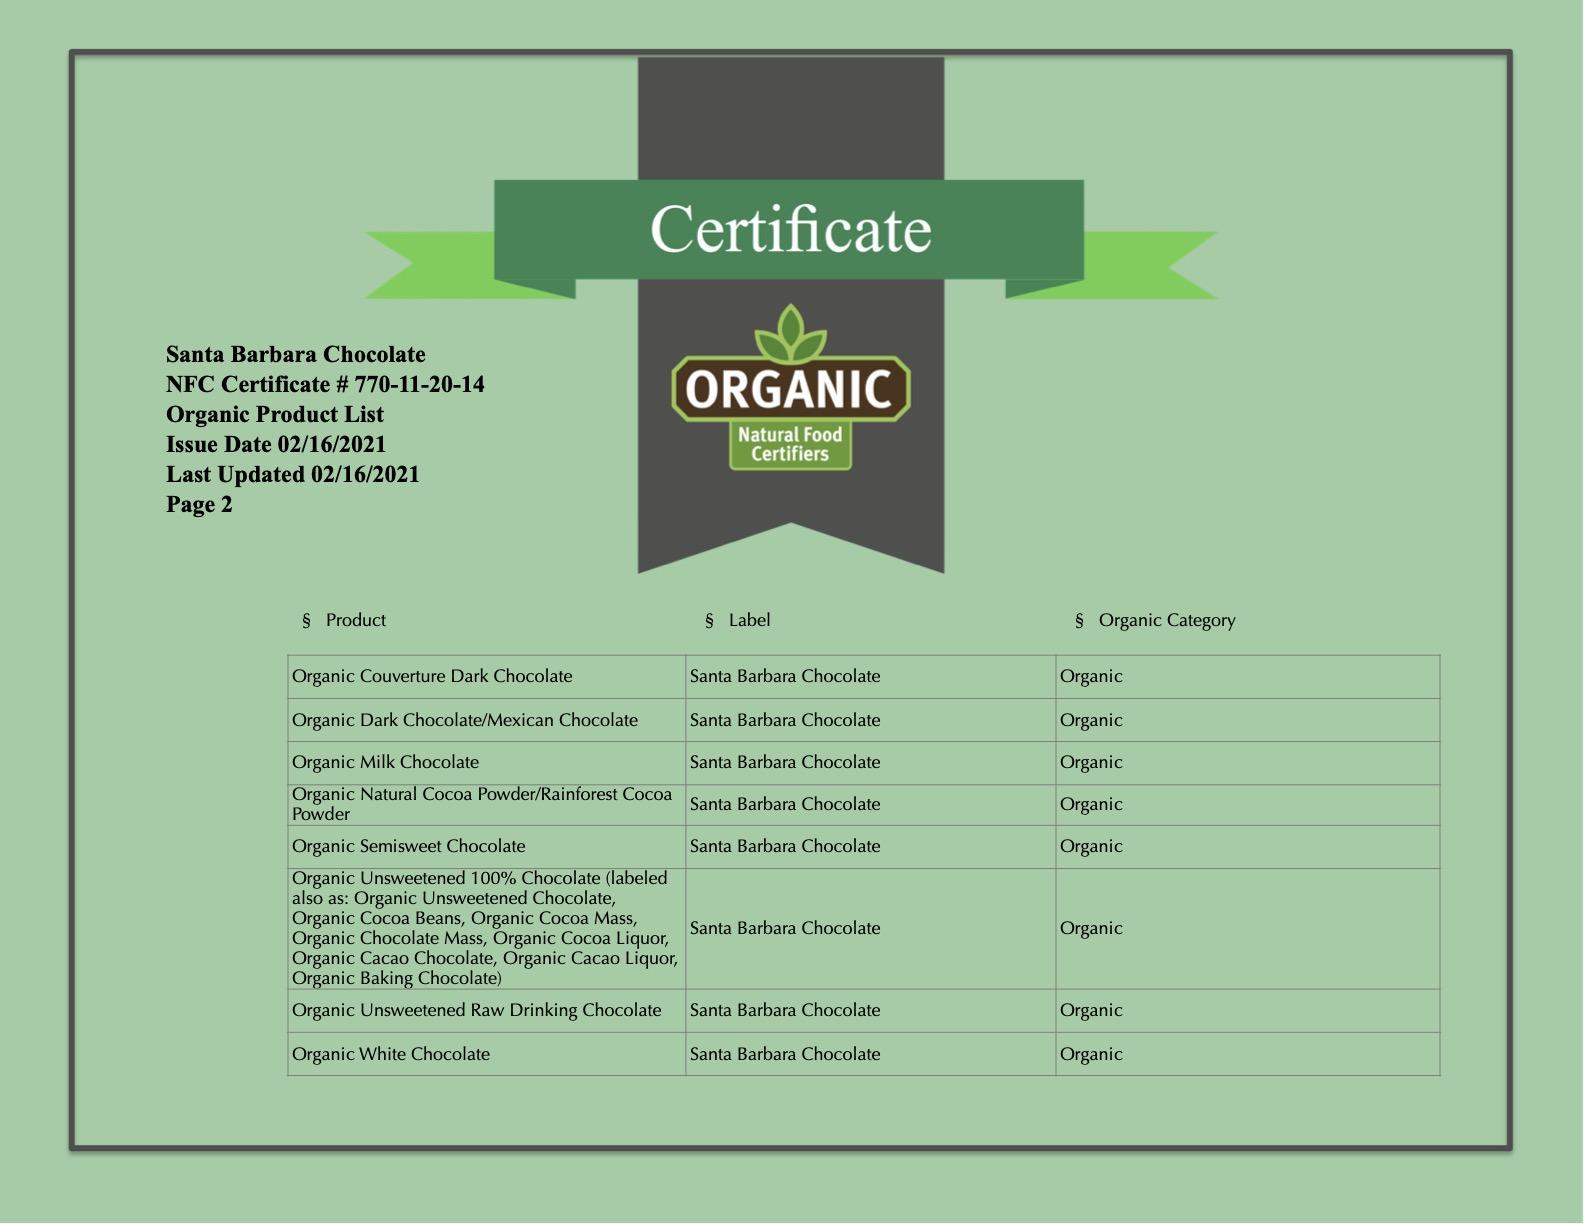 sbc-certificate-2-16-2021signed-1-11.jpg